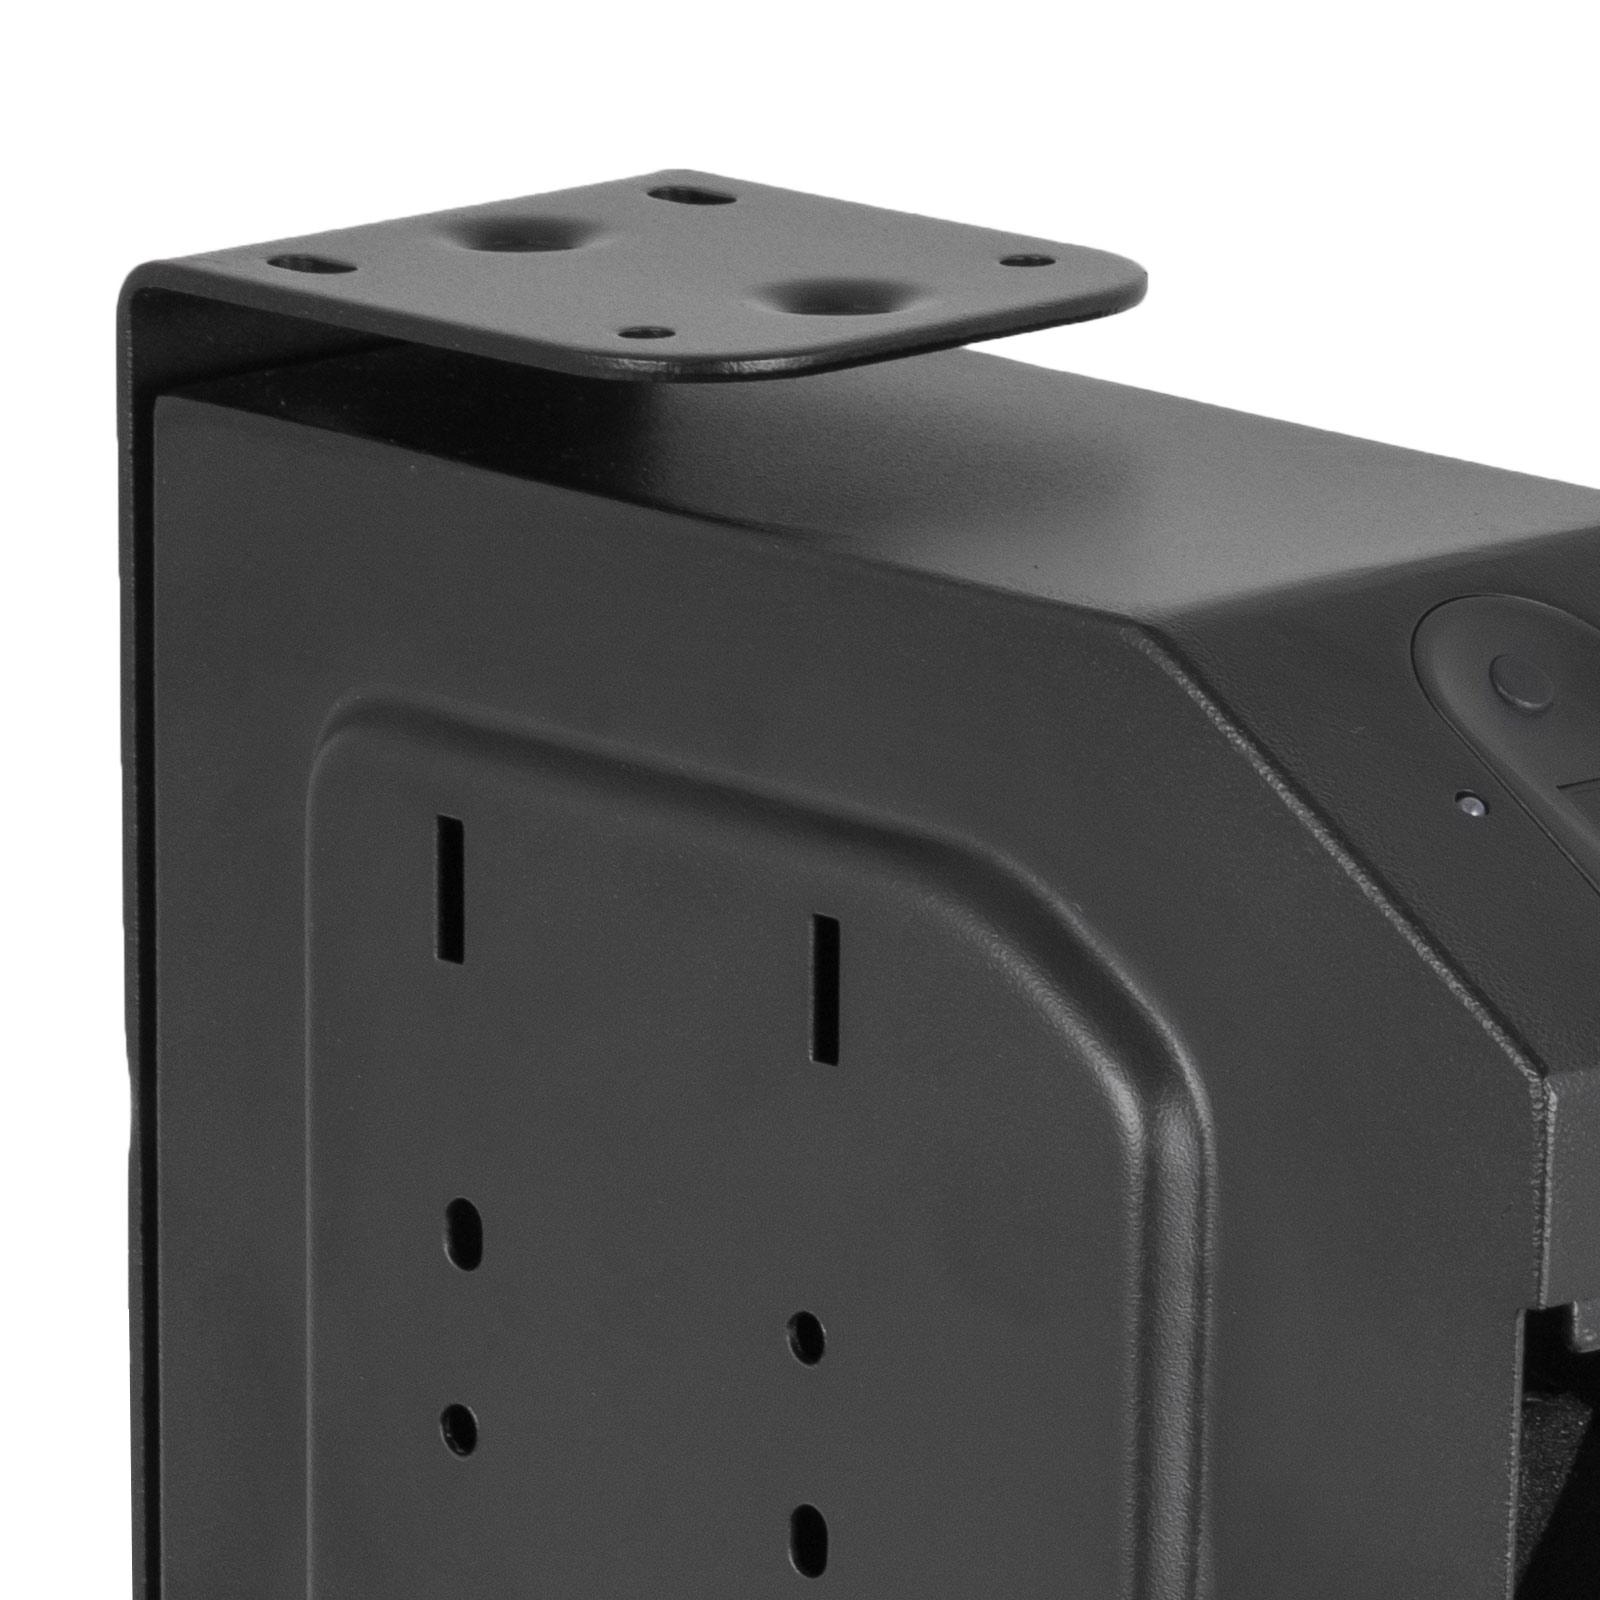 Pistol-Safe-Hand-Gun-Safe-Box-Biometric-Fingerprint-Storage-Home-Office-Security thumbnail 10